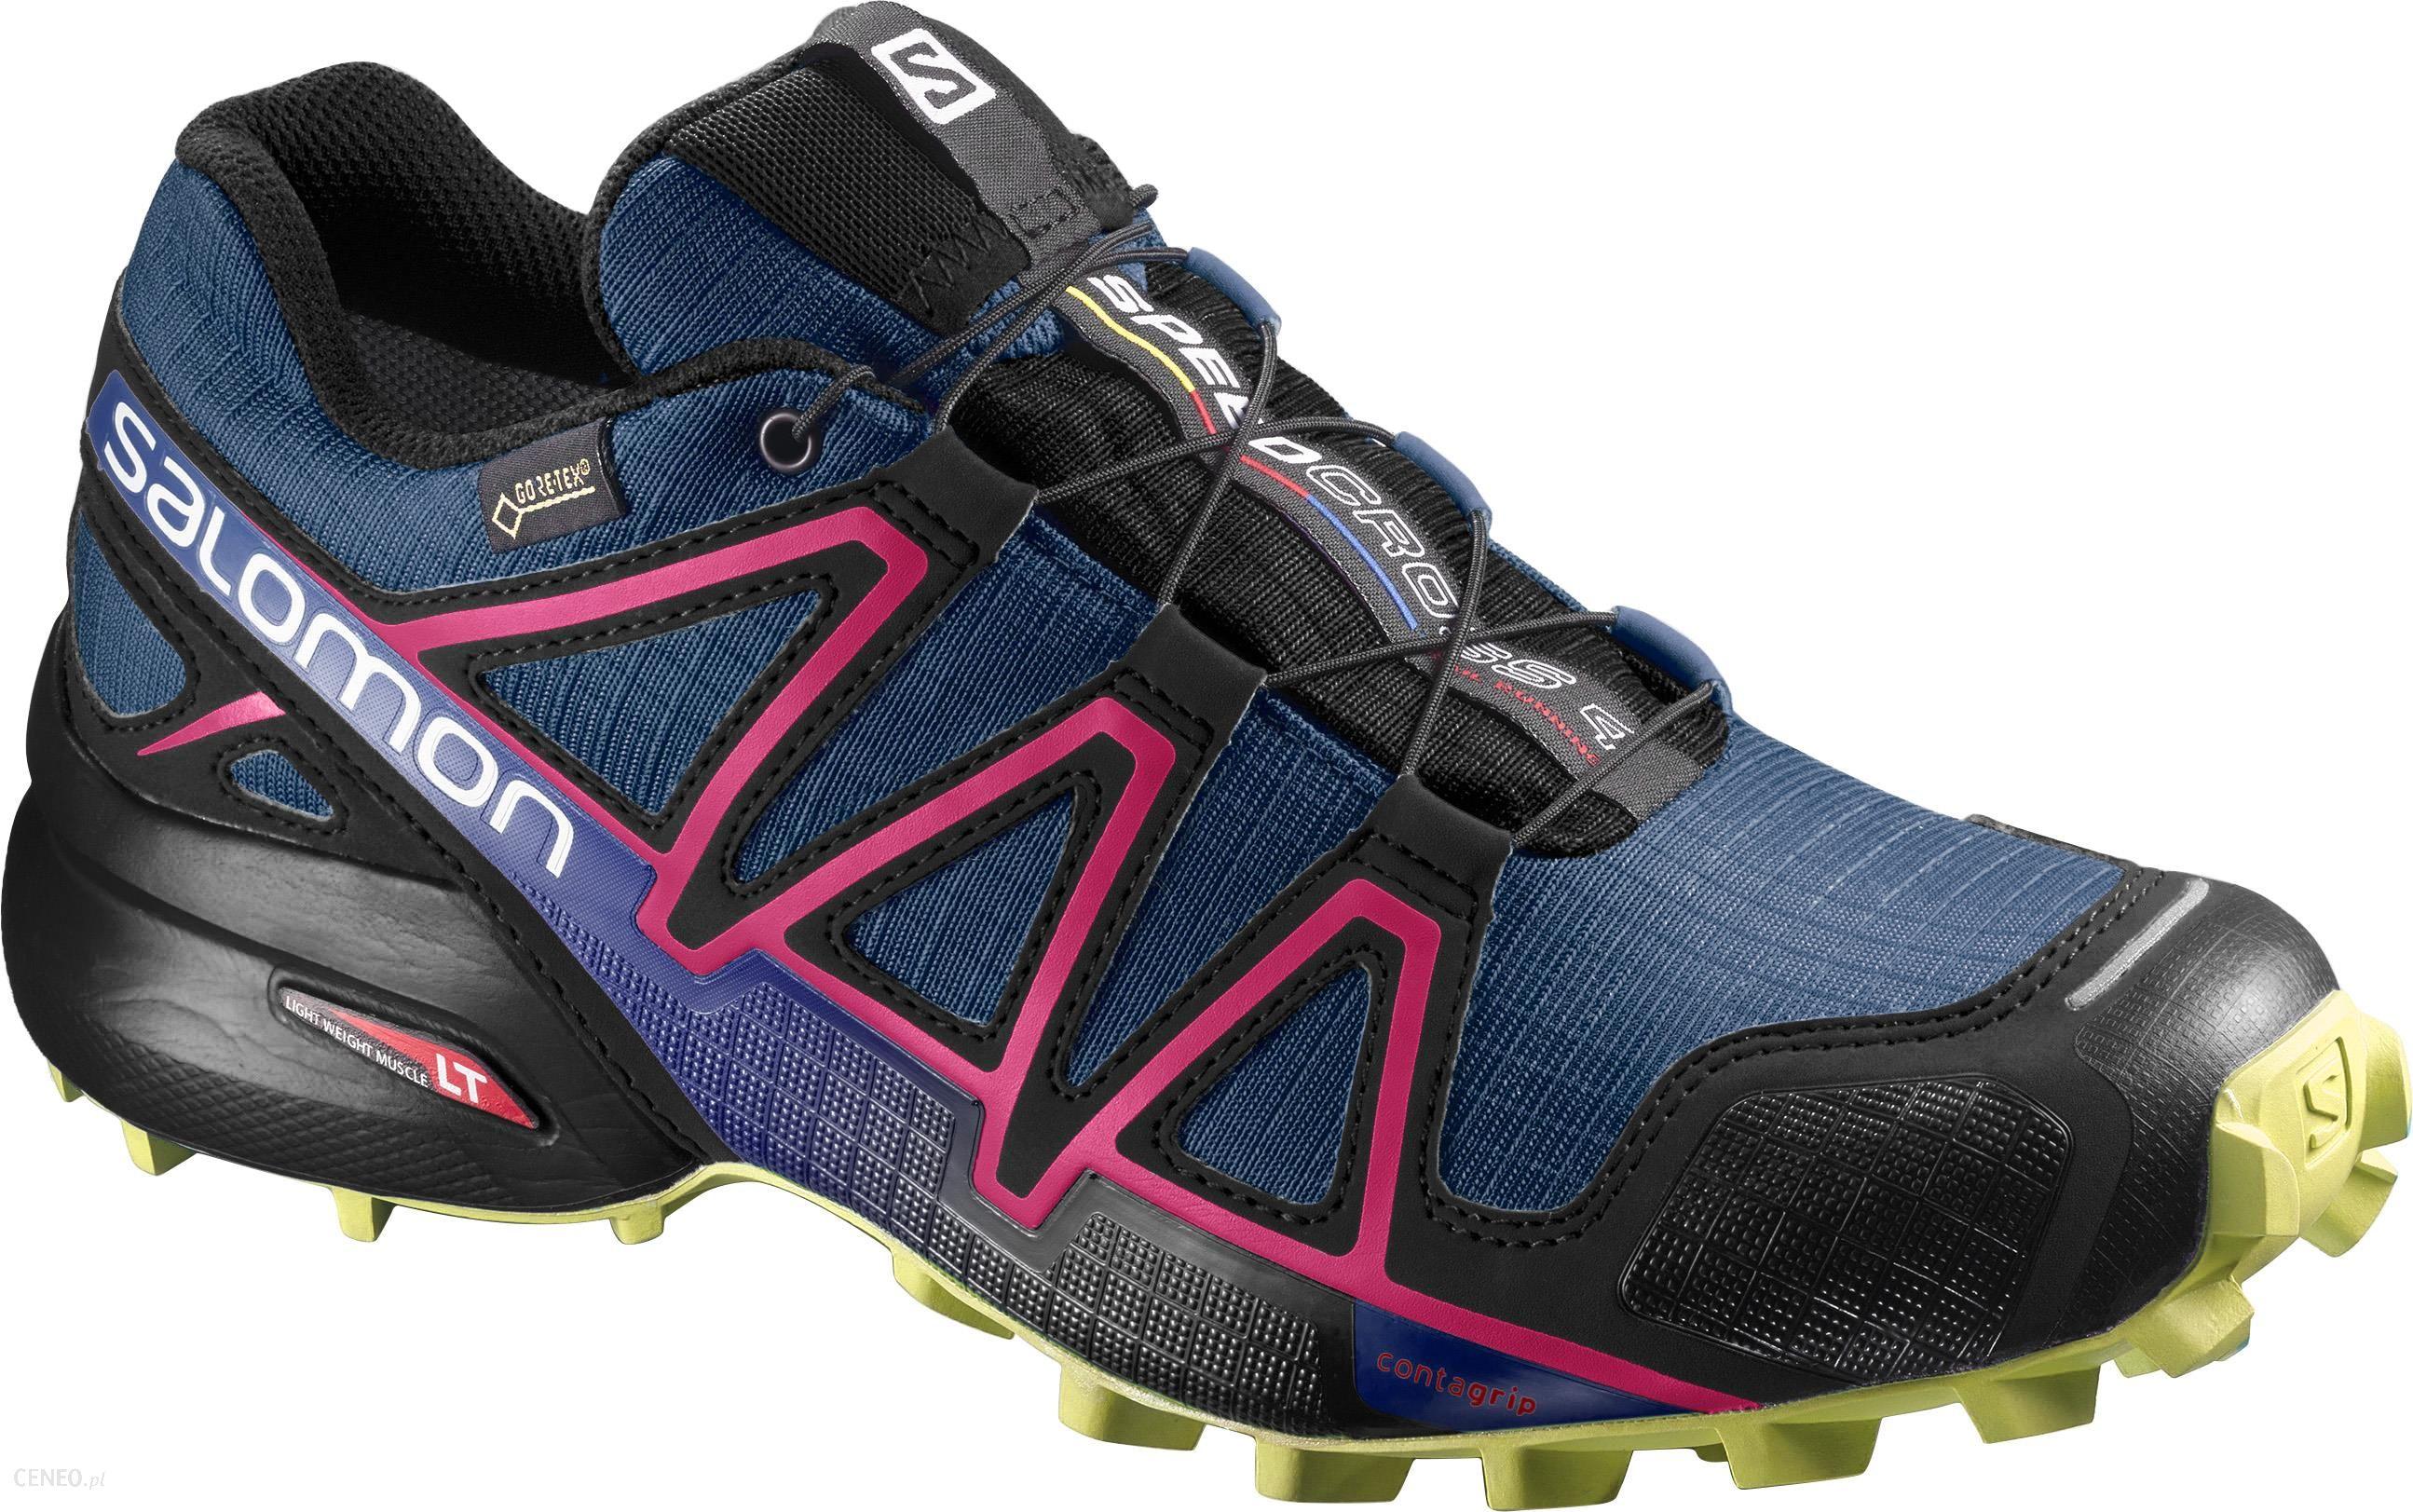 buy salomon online, Salomon Speedcross 3 GTX Blue Trail